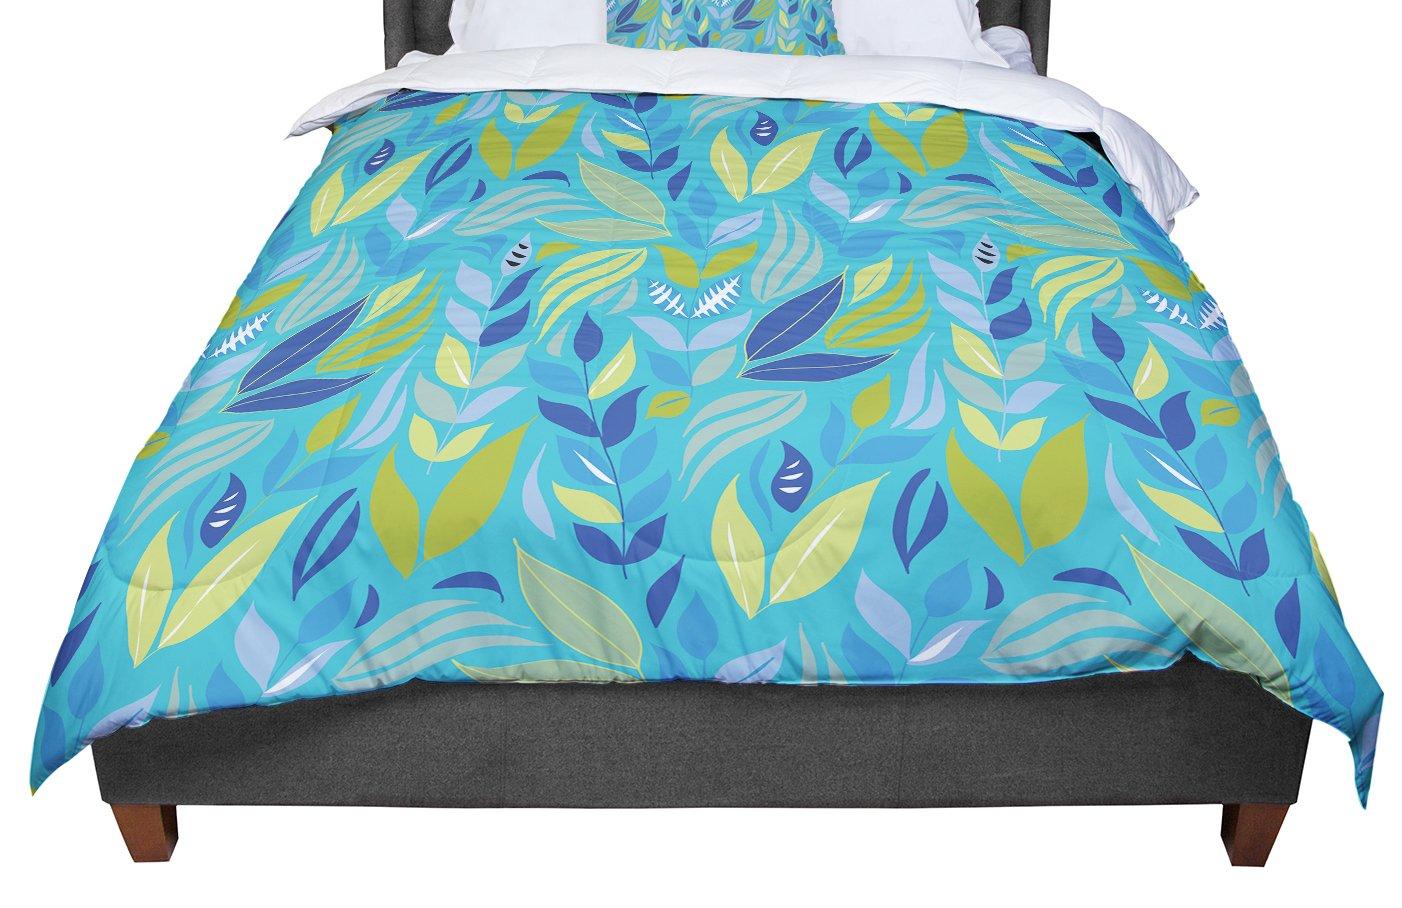 88 X 88 KESS InHouse Michelle Drew Underwater Bouquet Queen Comforter